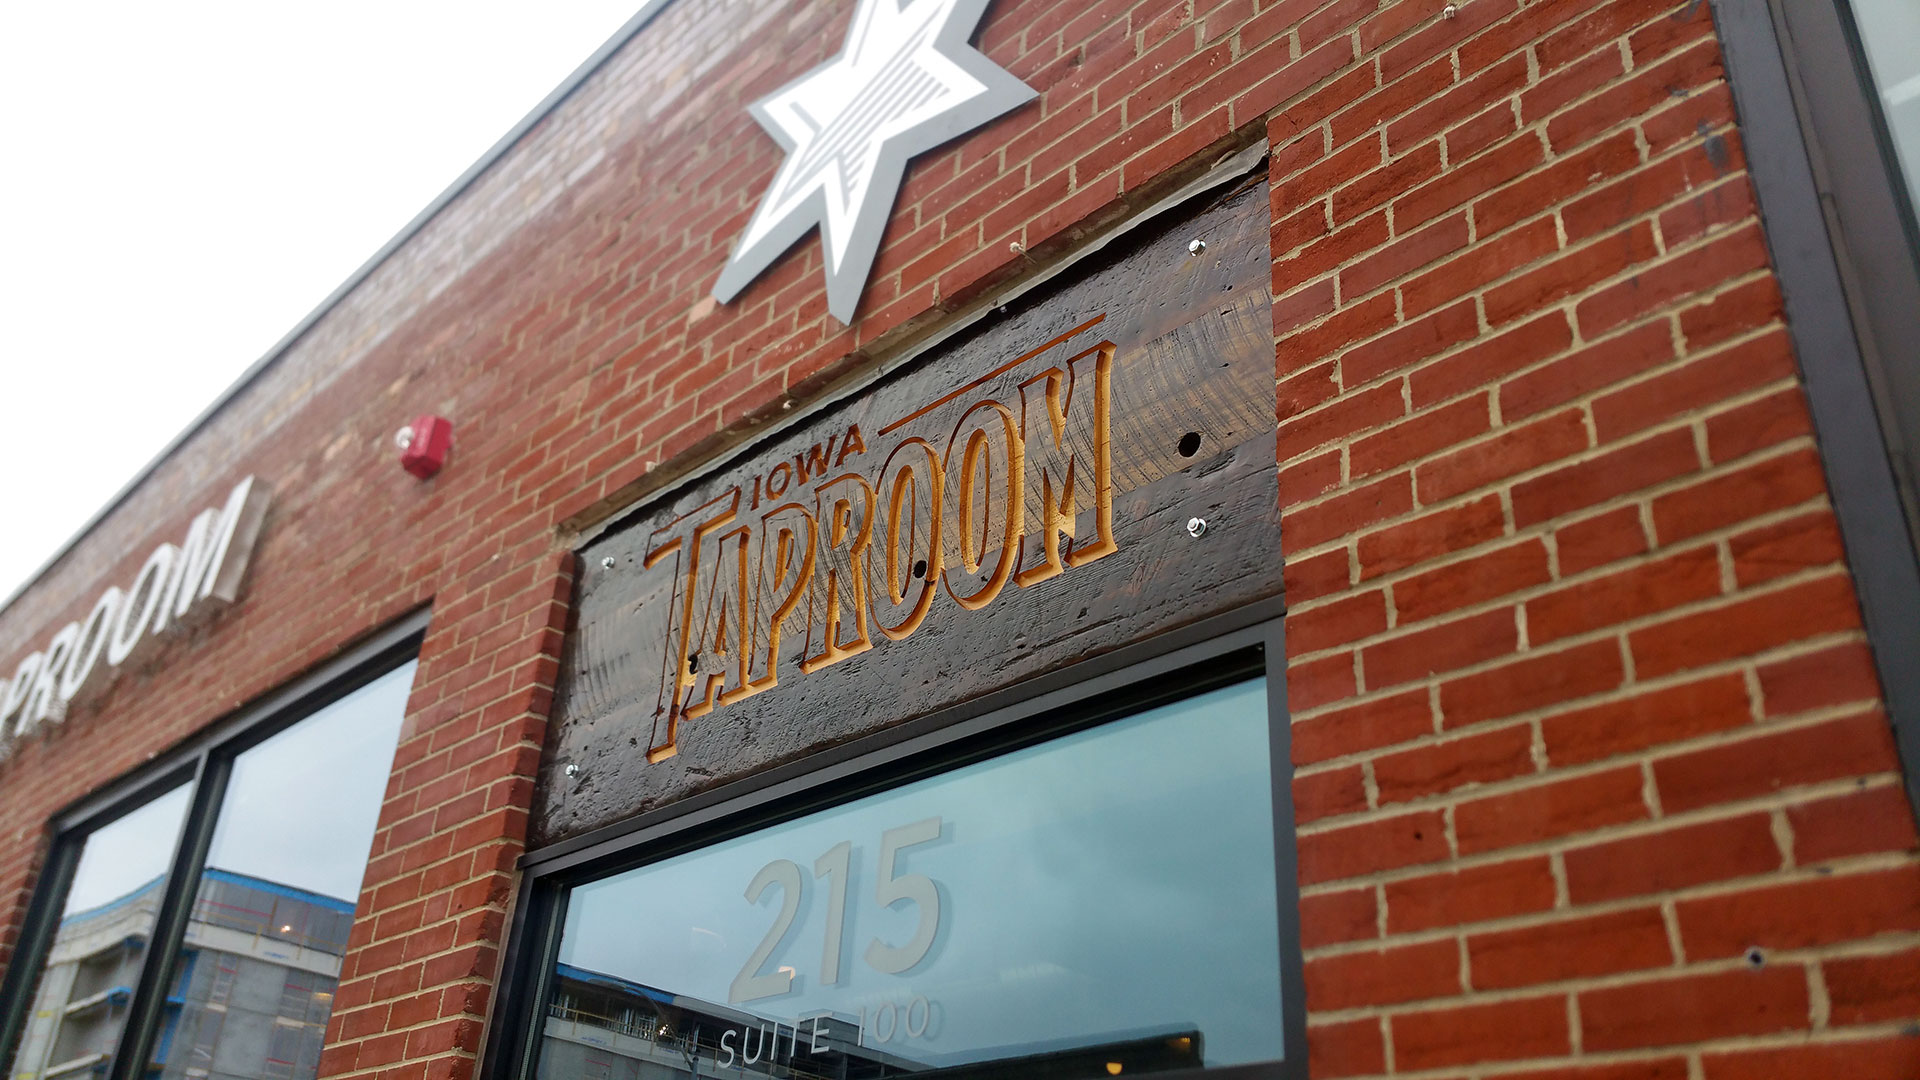 Iowa Taproom